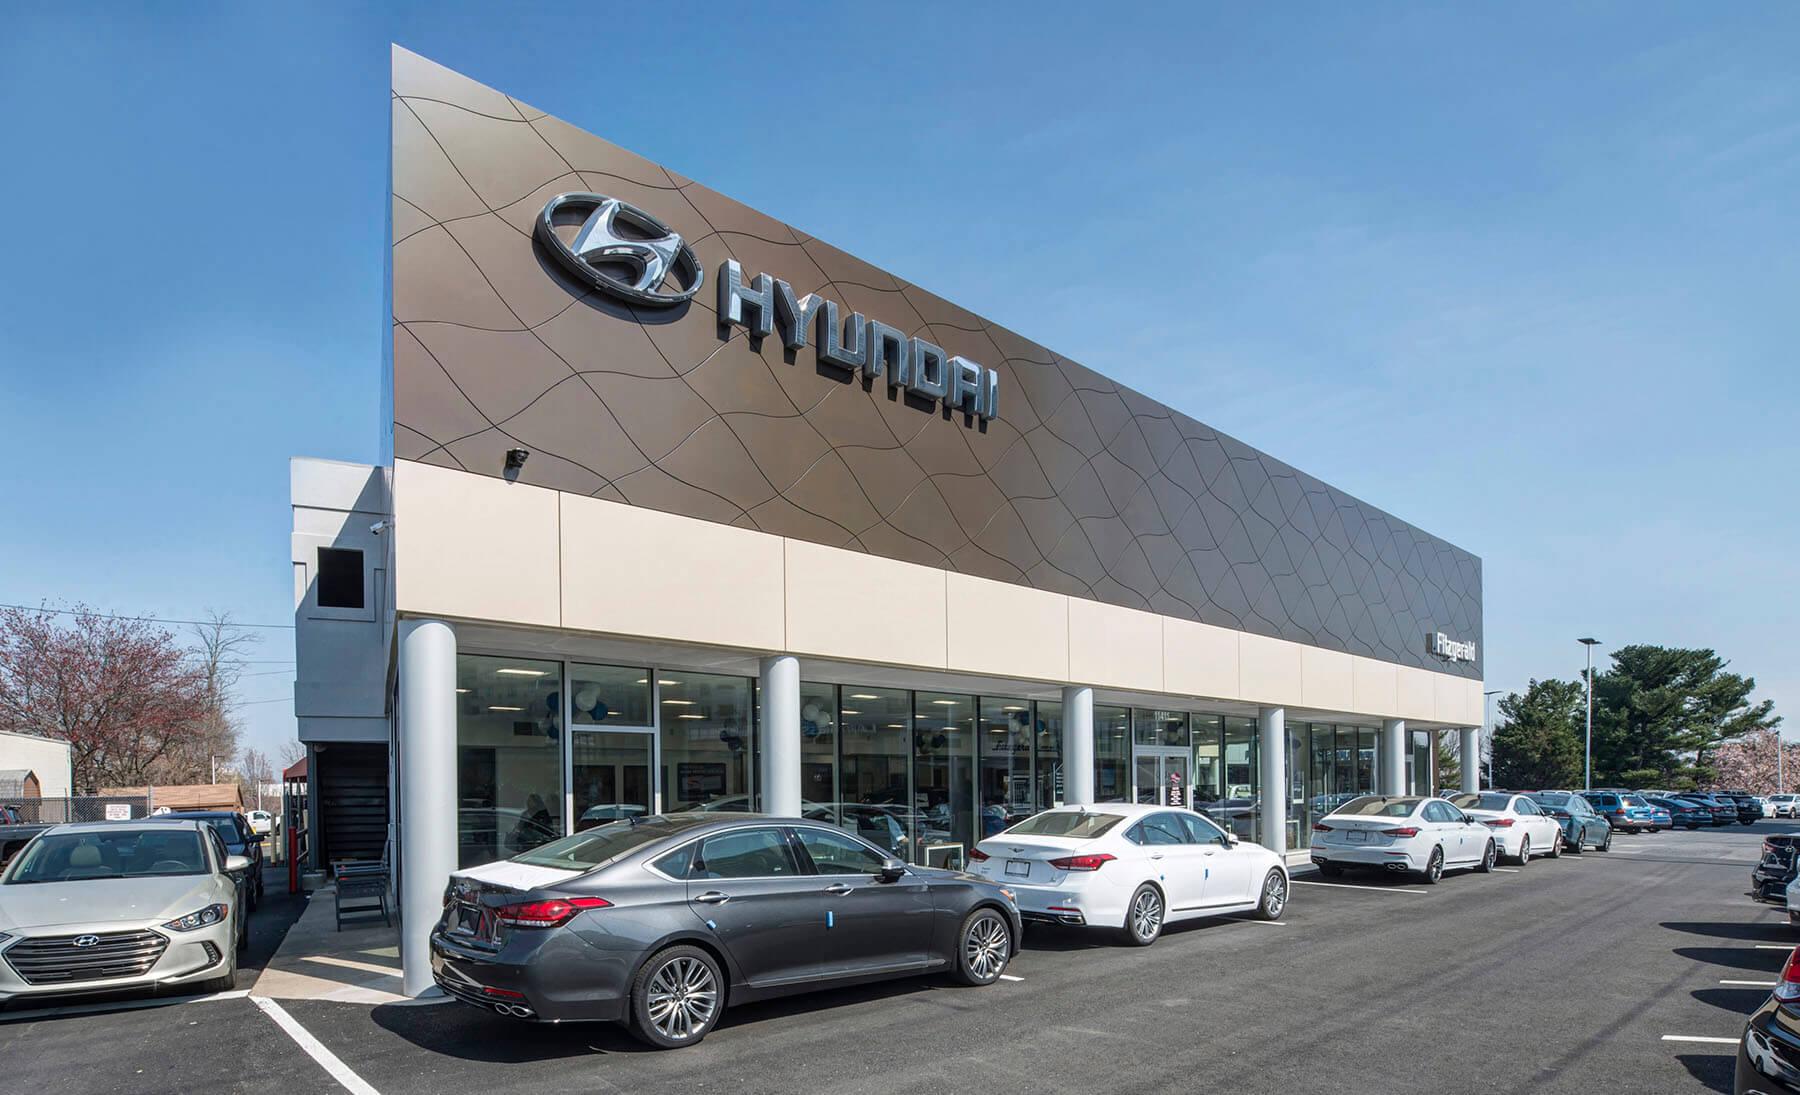 Fitzgerald Auto Mall Used Cars >> Fitzgerald Auto Malls Fitzgerald Hyundai Rockville